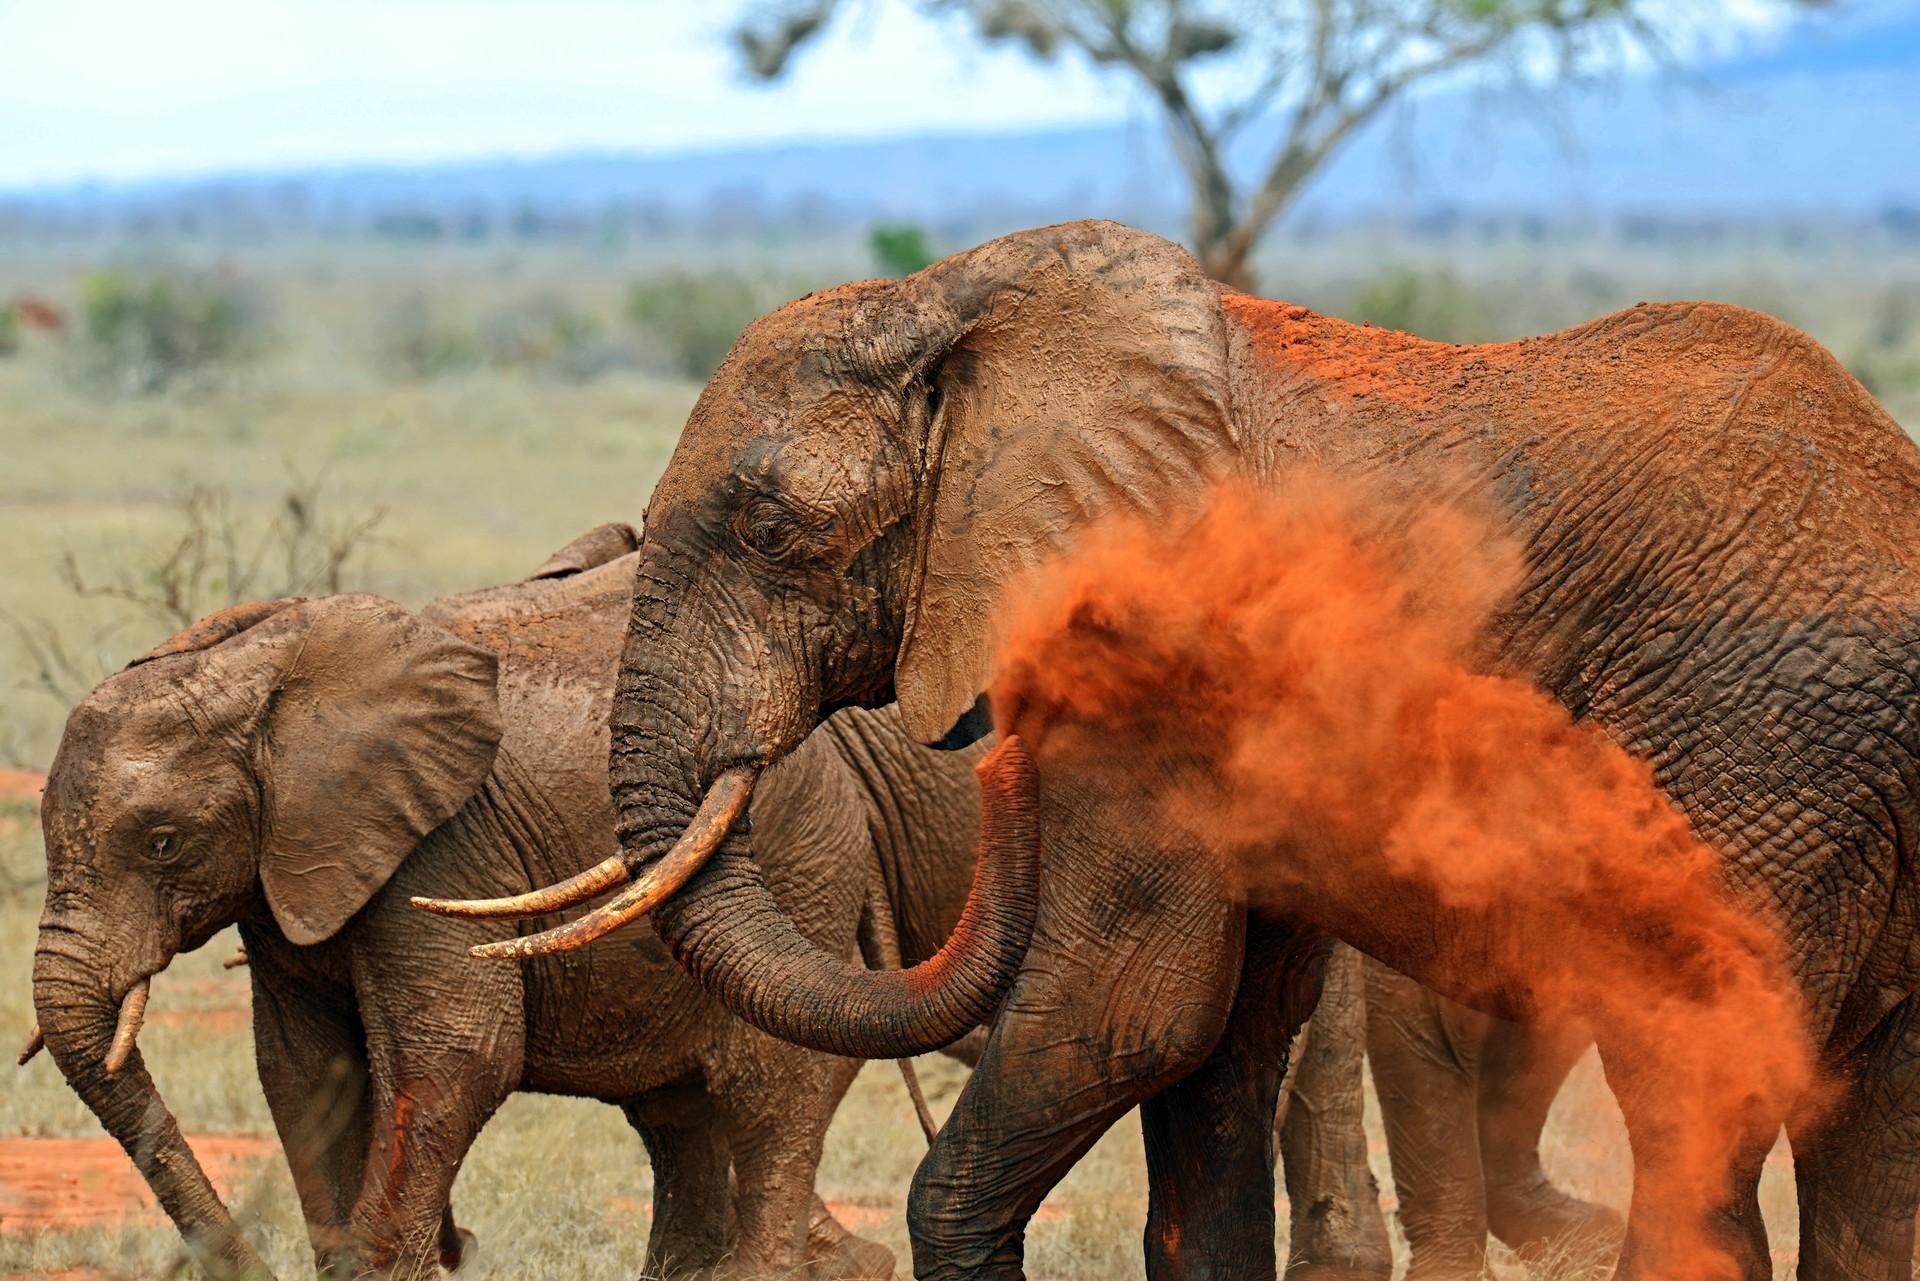 An African Love Story by Daphne Sheldrick is set near Tsavo East National Park, Kenya